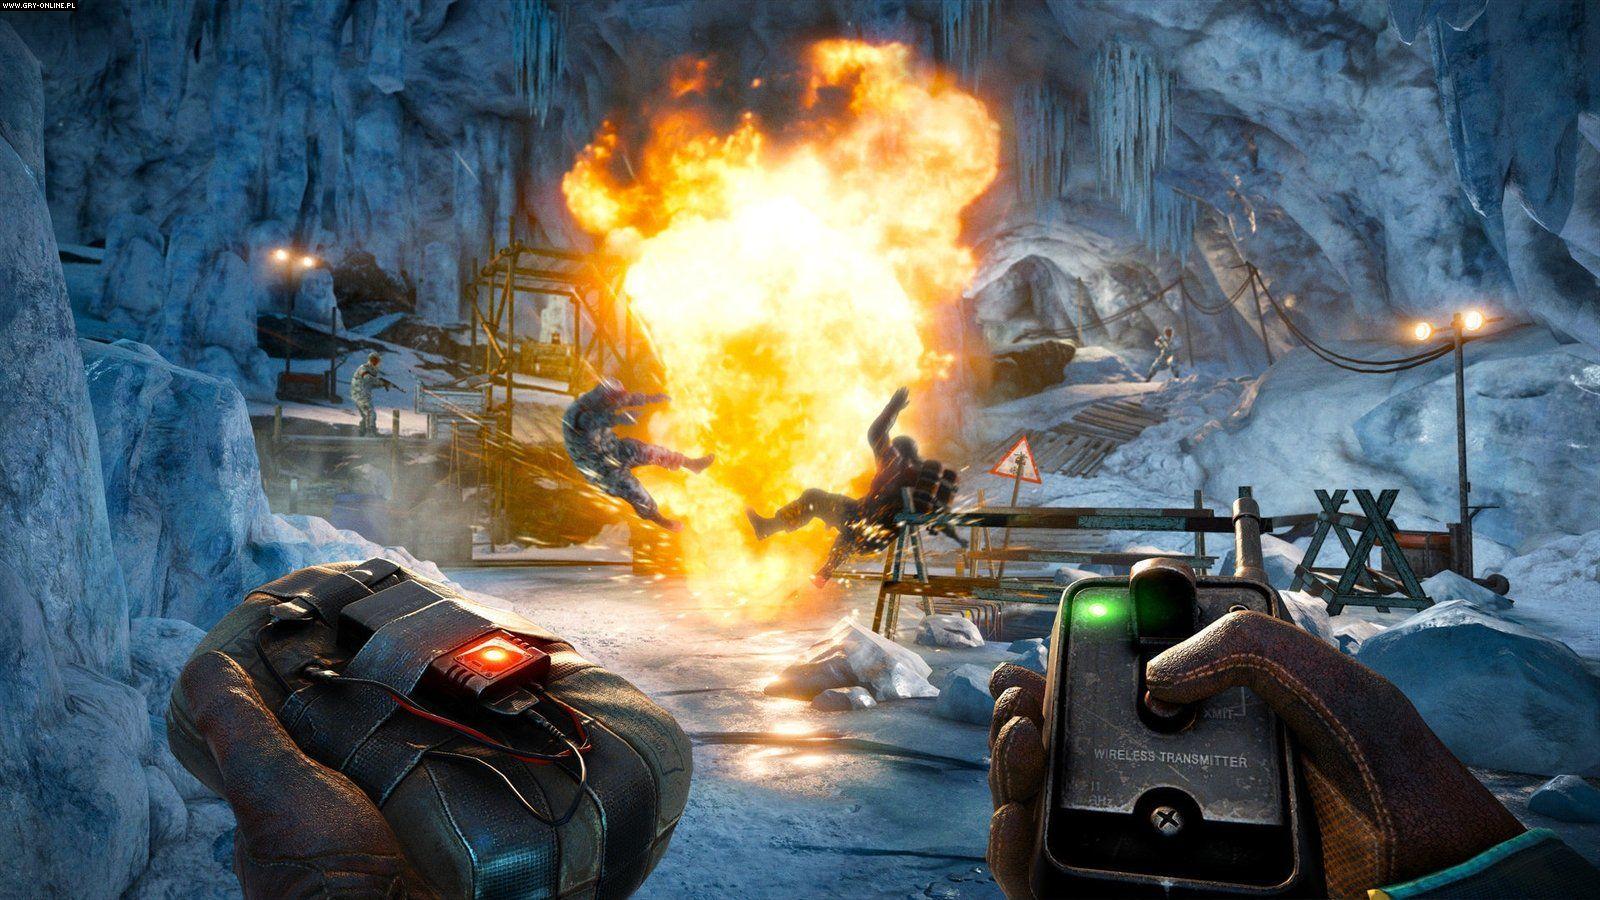 Far Cry 4 image #2